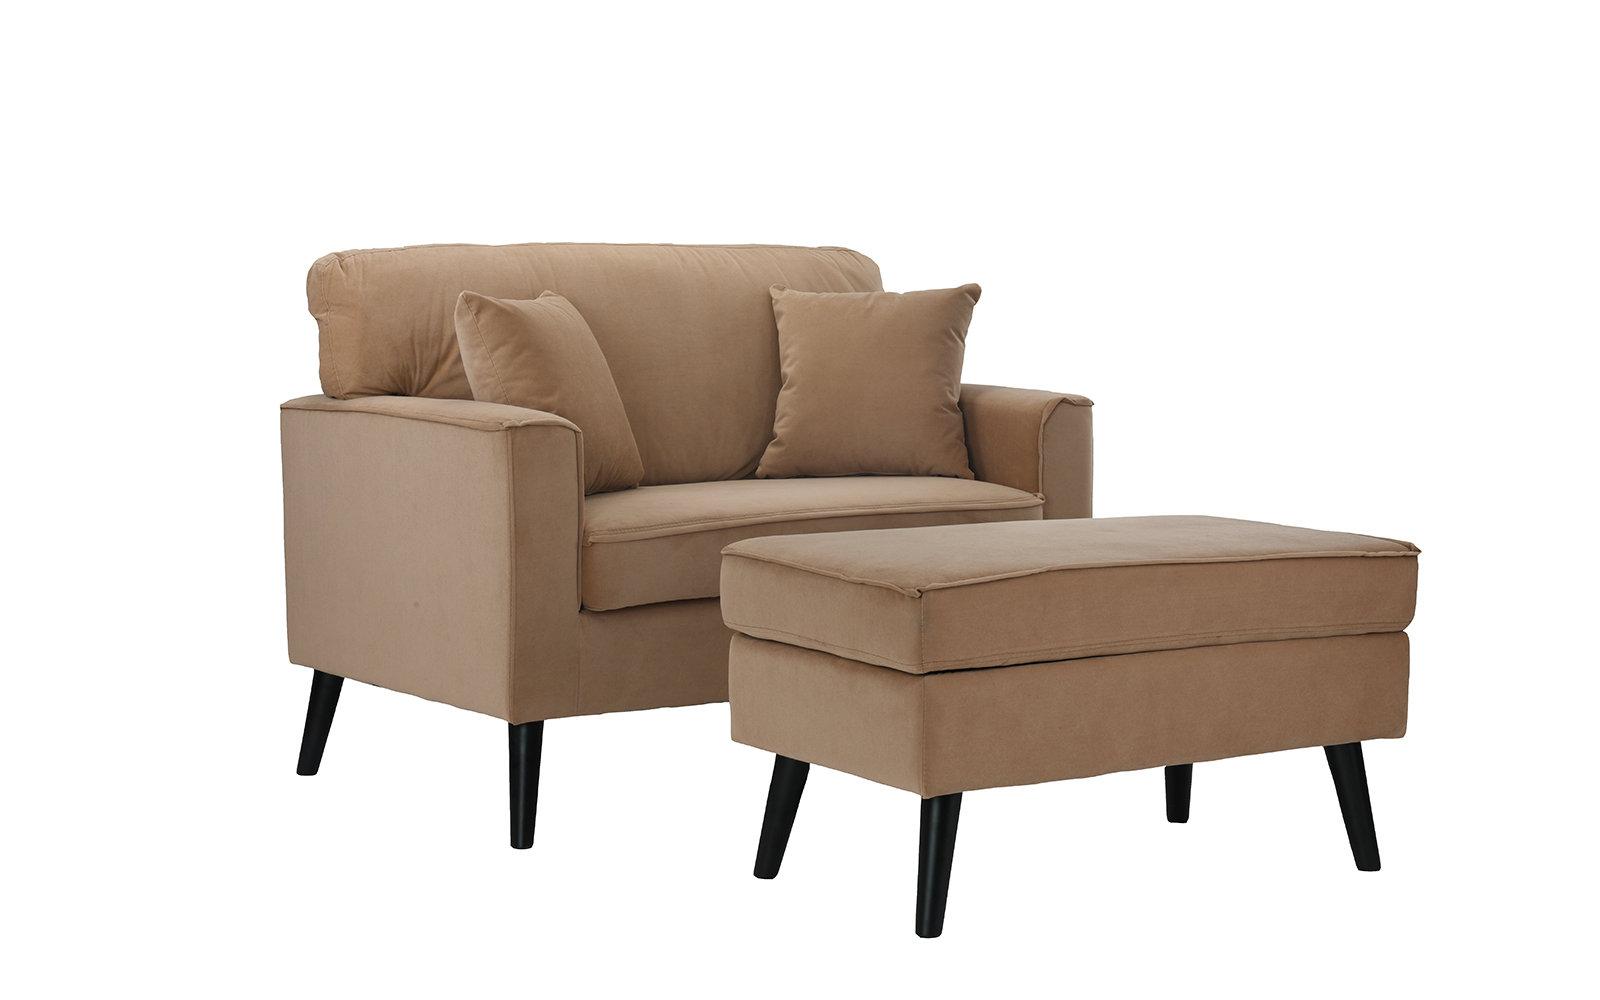 pogue 338 armchair and ottoman lttn1700 piid=